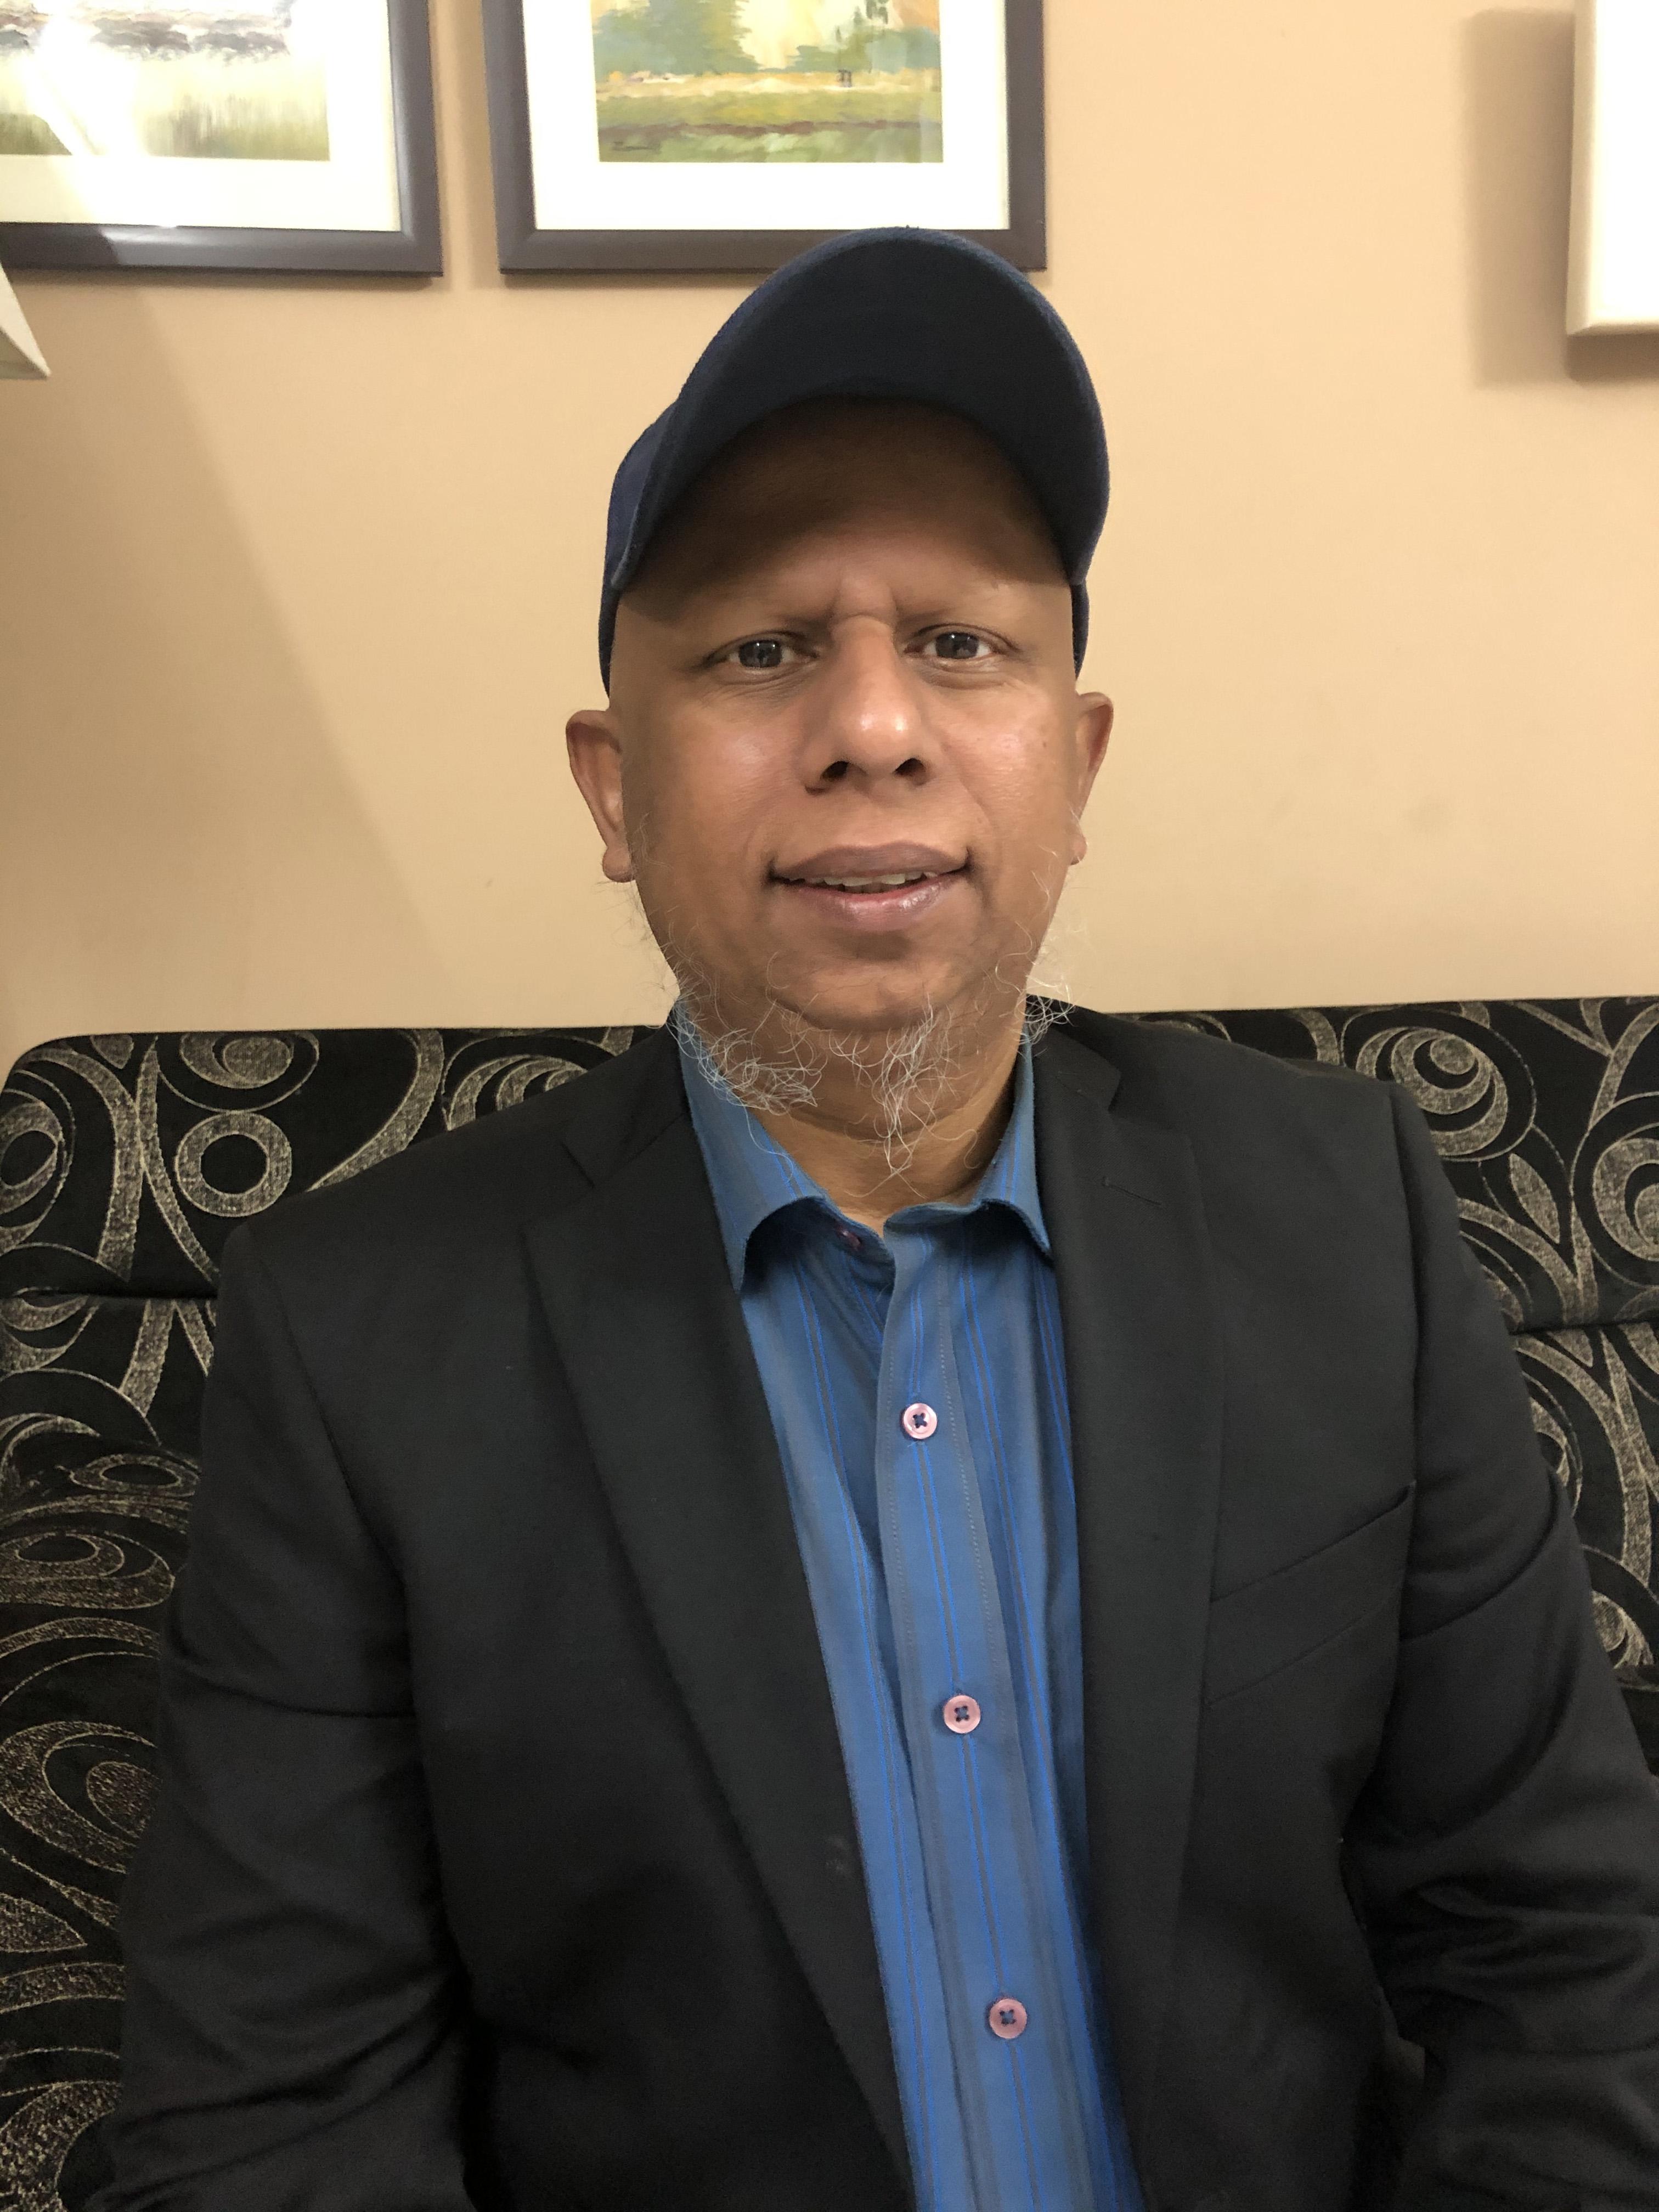 Mr. Mohammed Sohel Islam